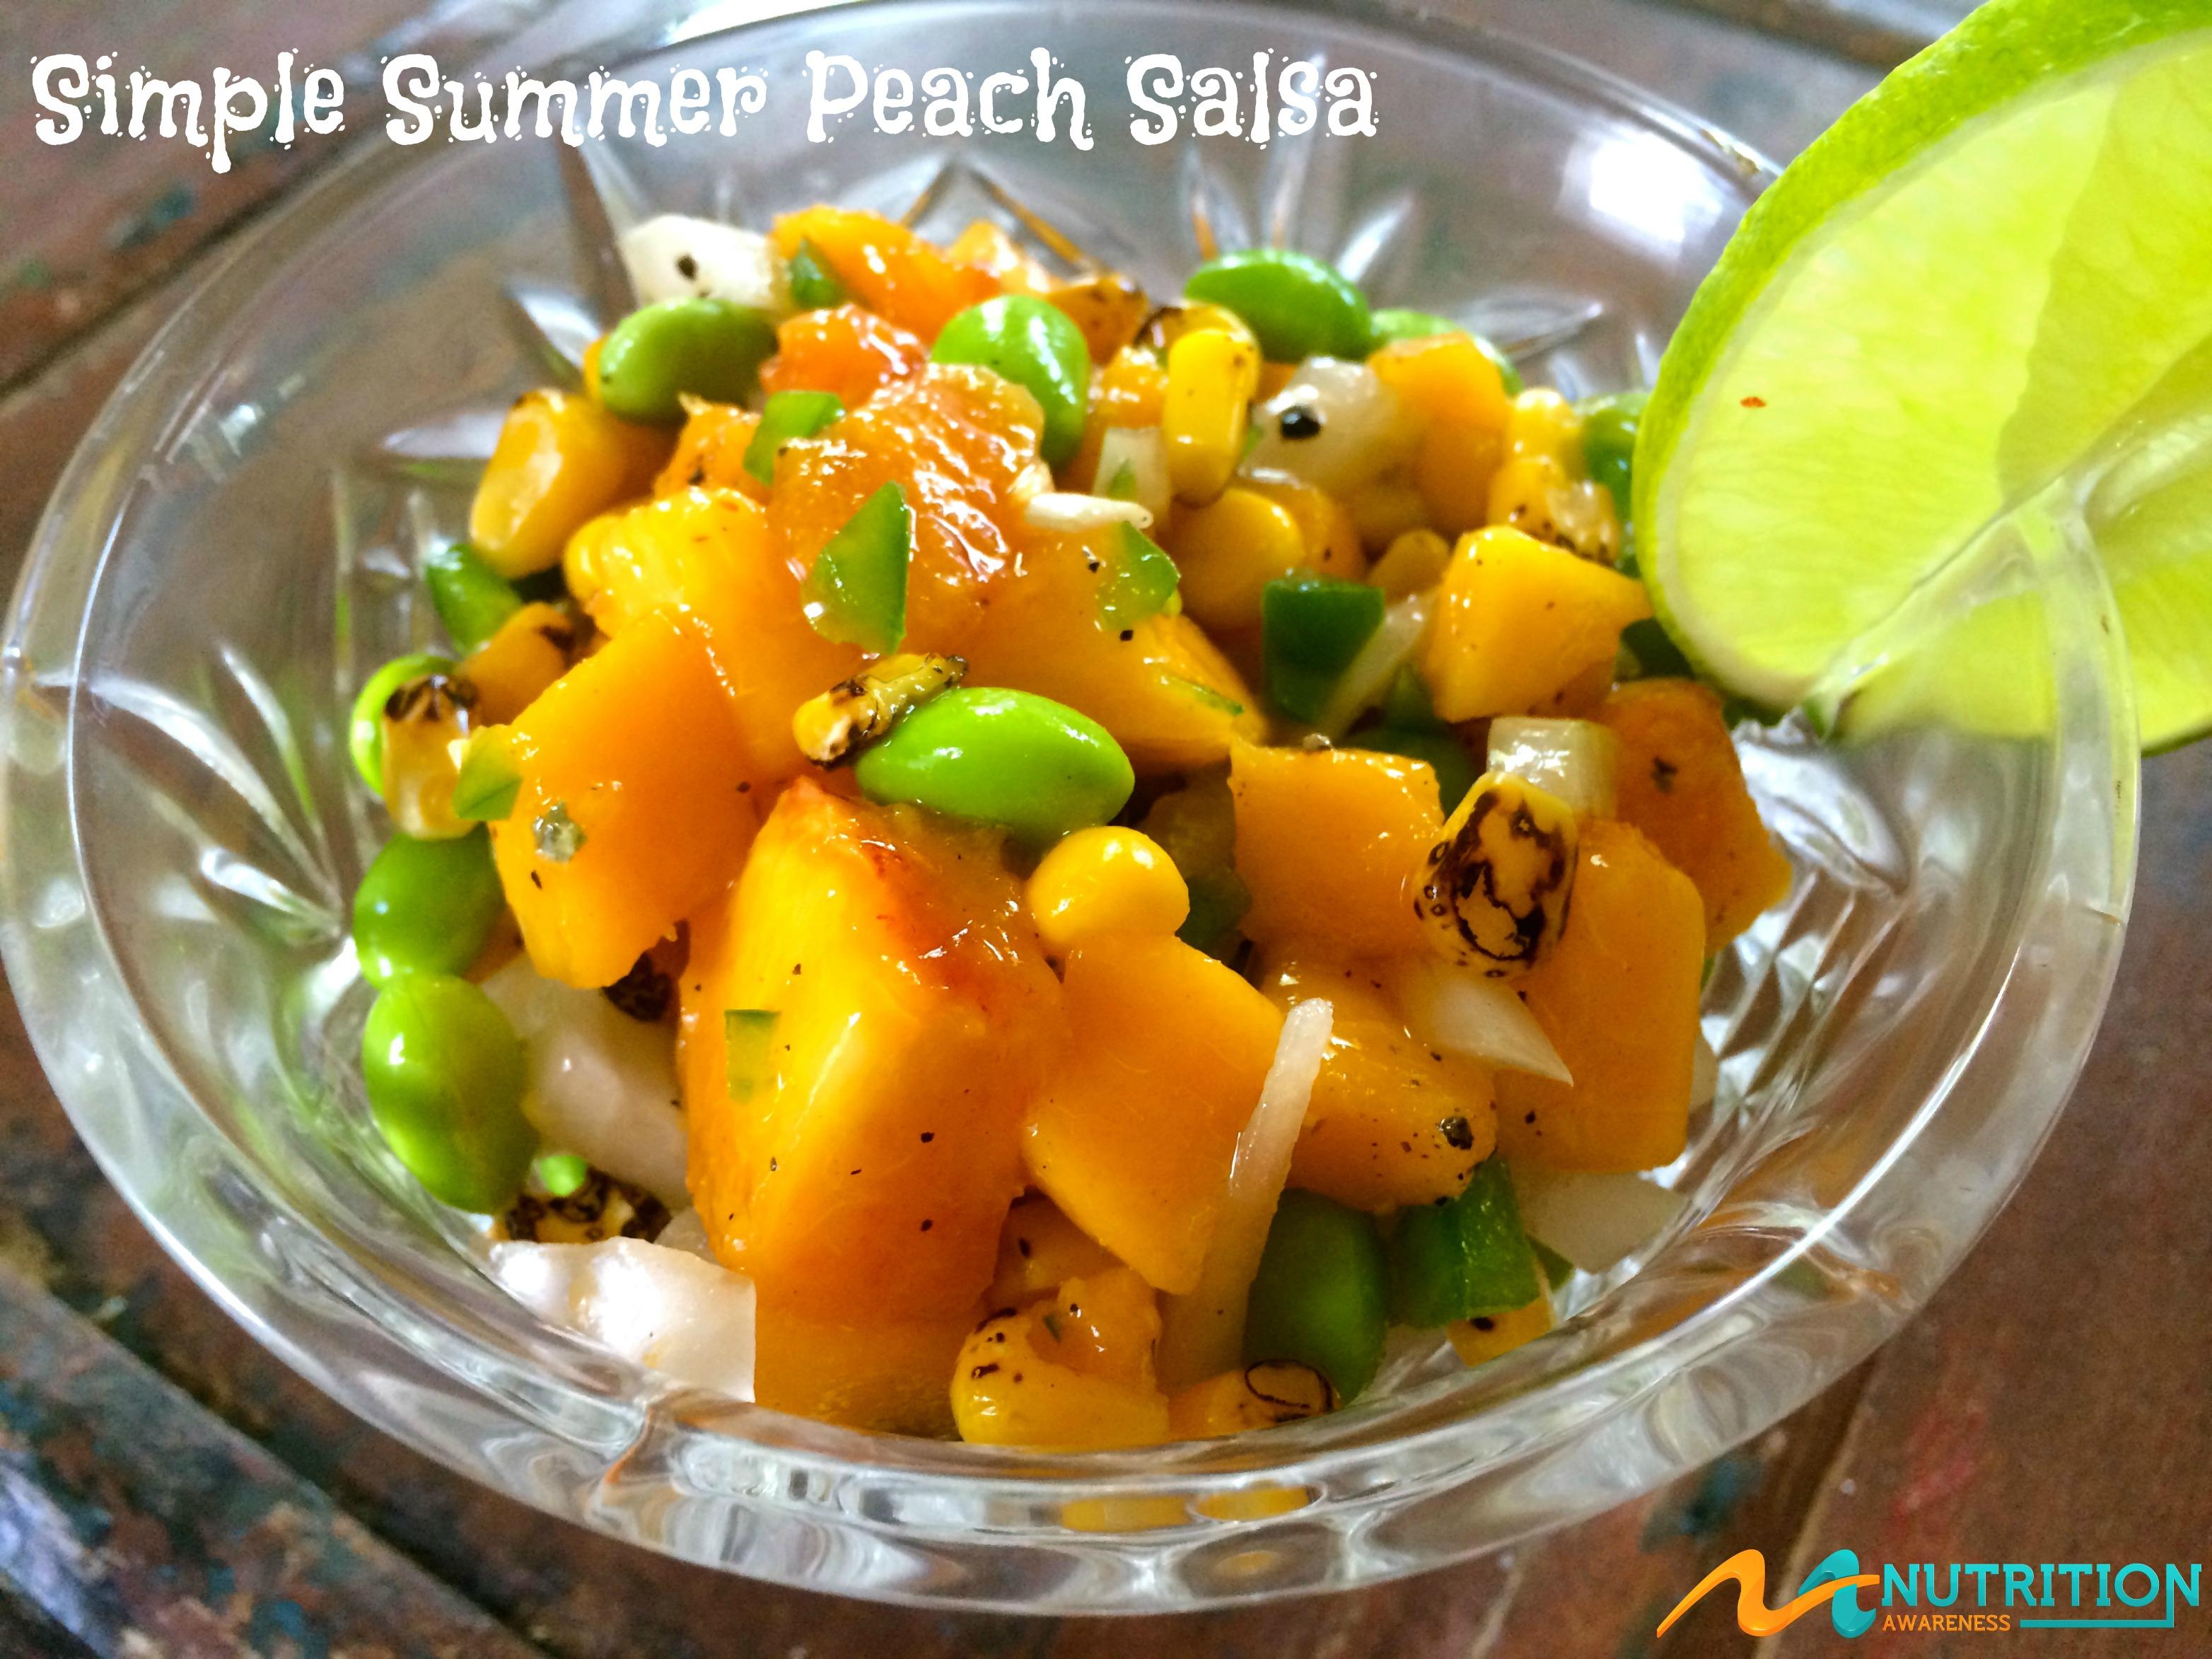 Simple Summer Peach Salsa - Orlando Dietitian Nutritionist